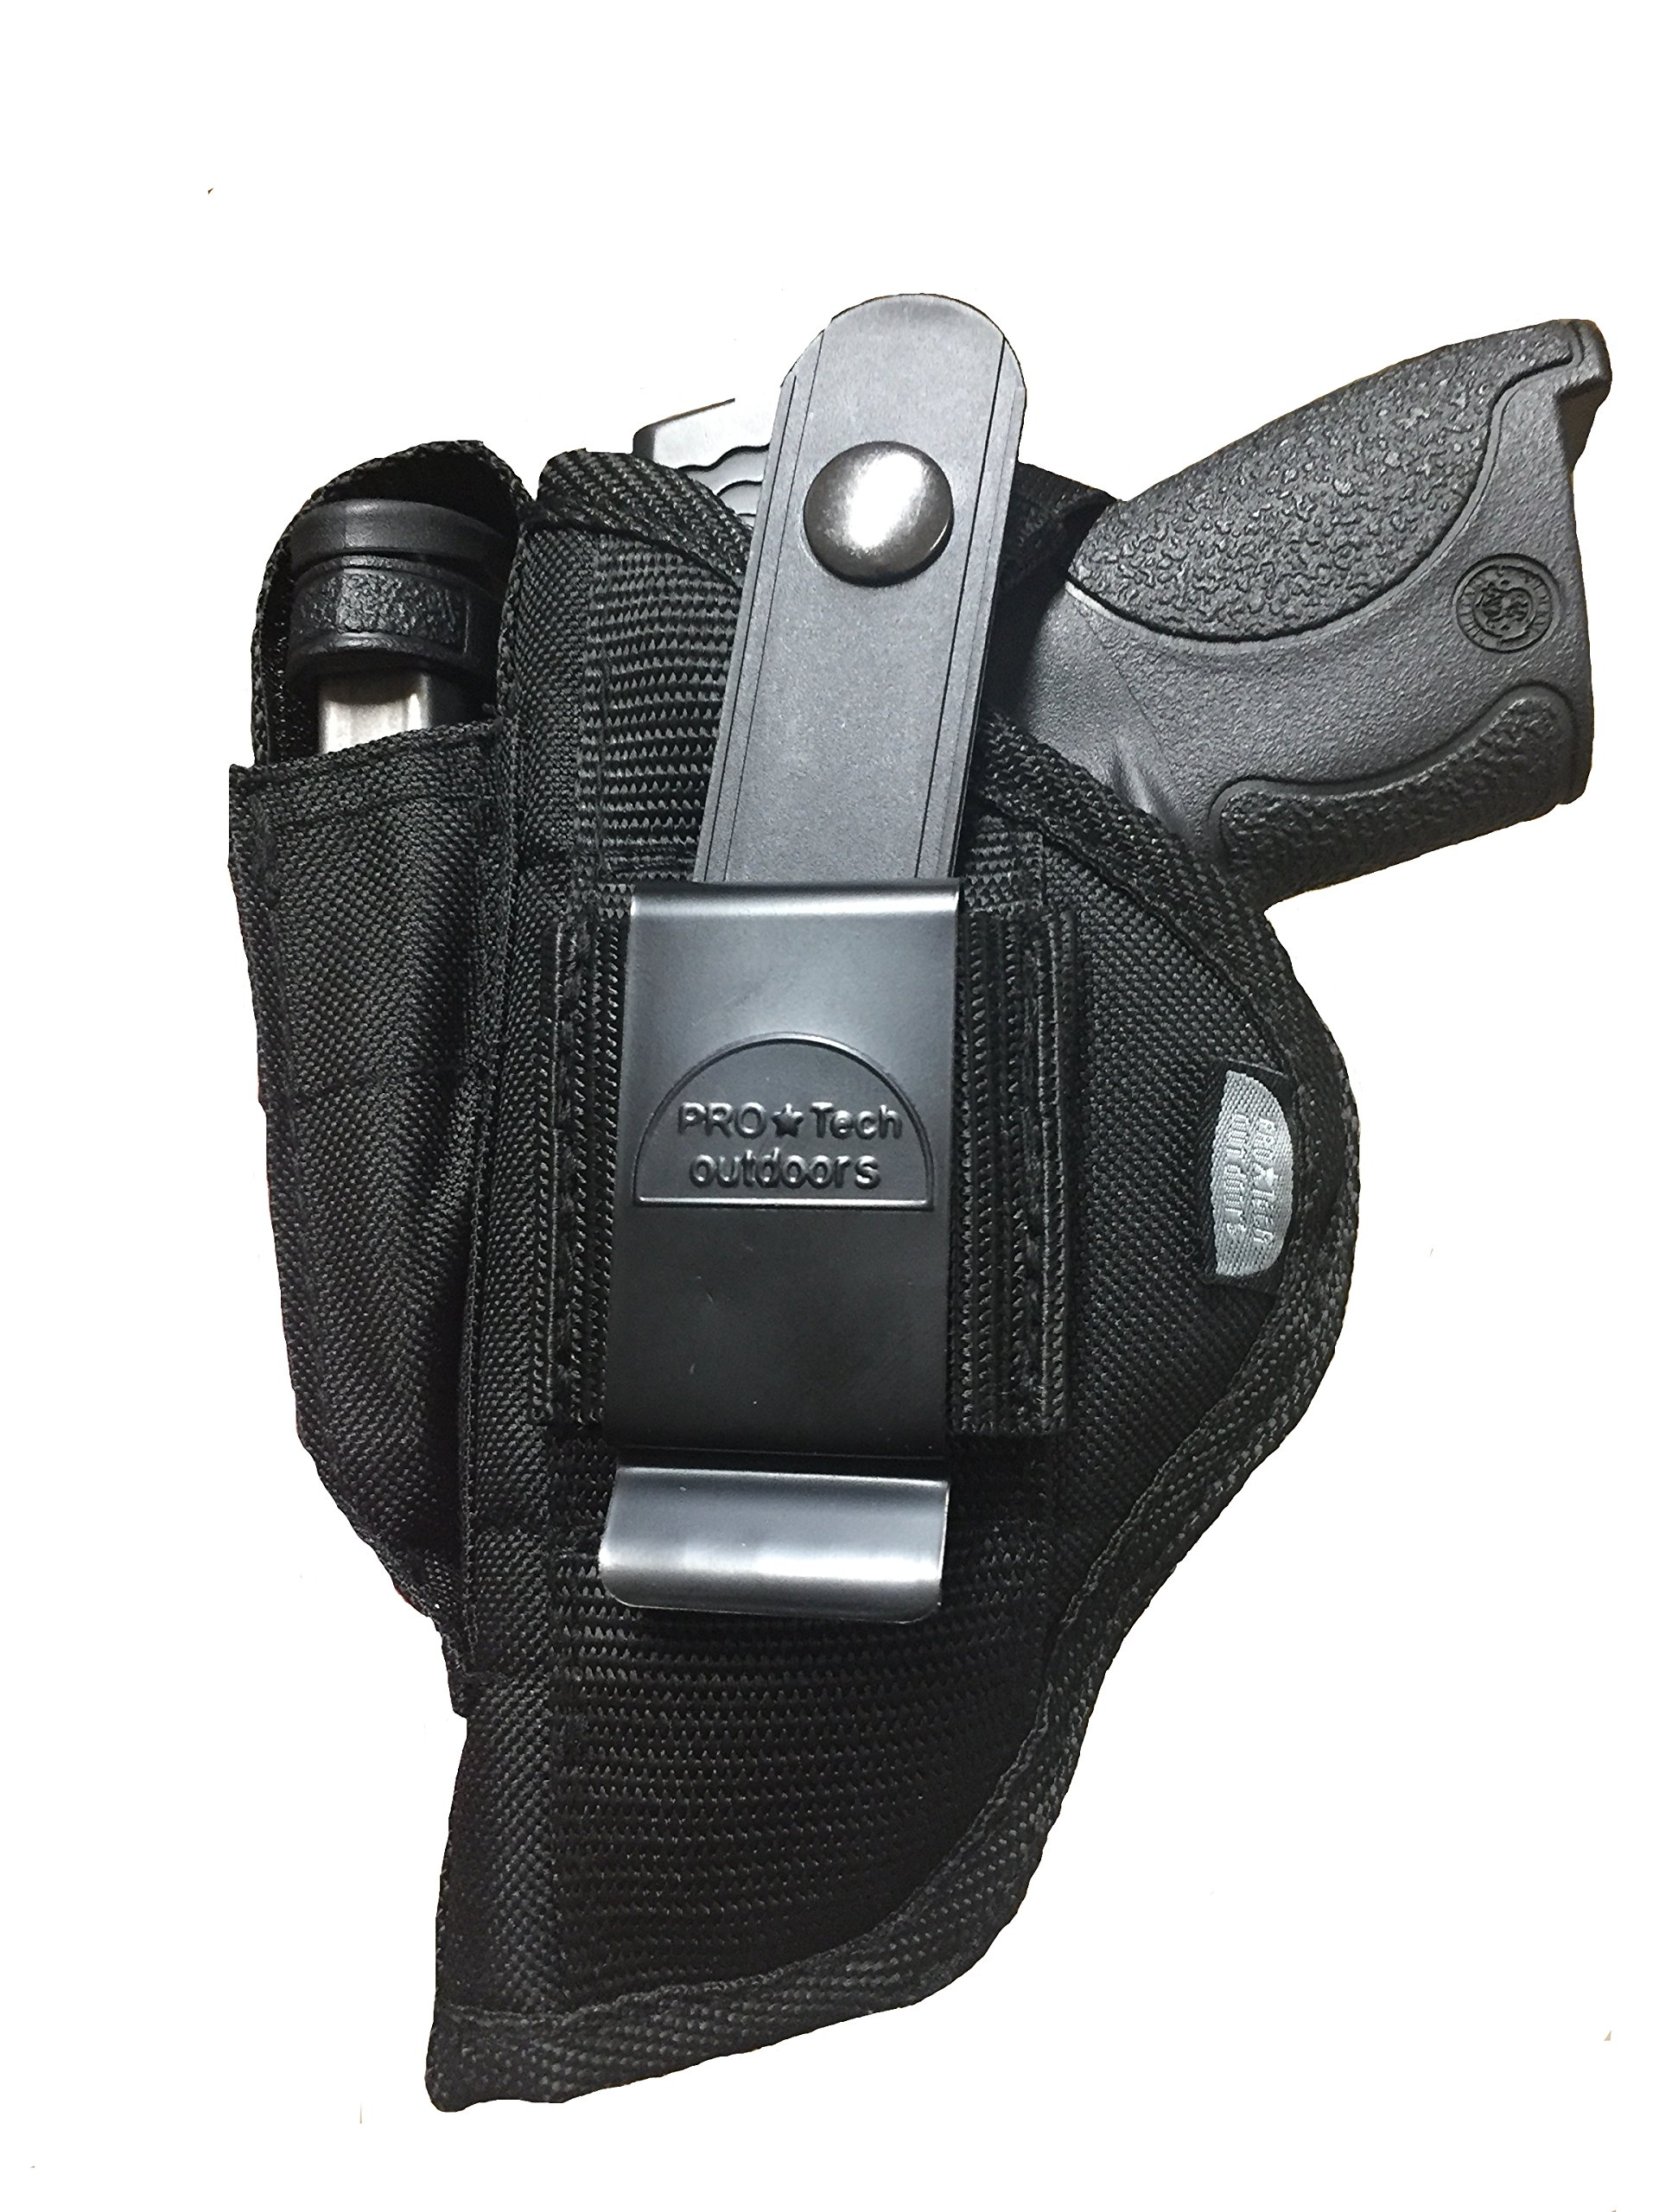 Gun Holster Fits the Glock 20 10mm